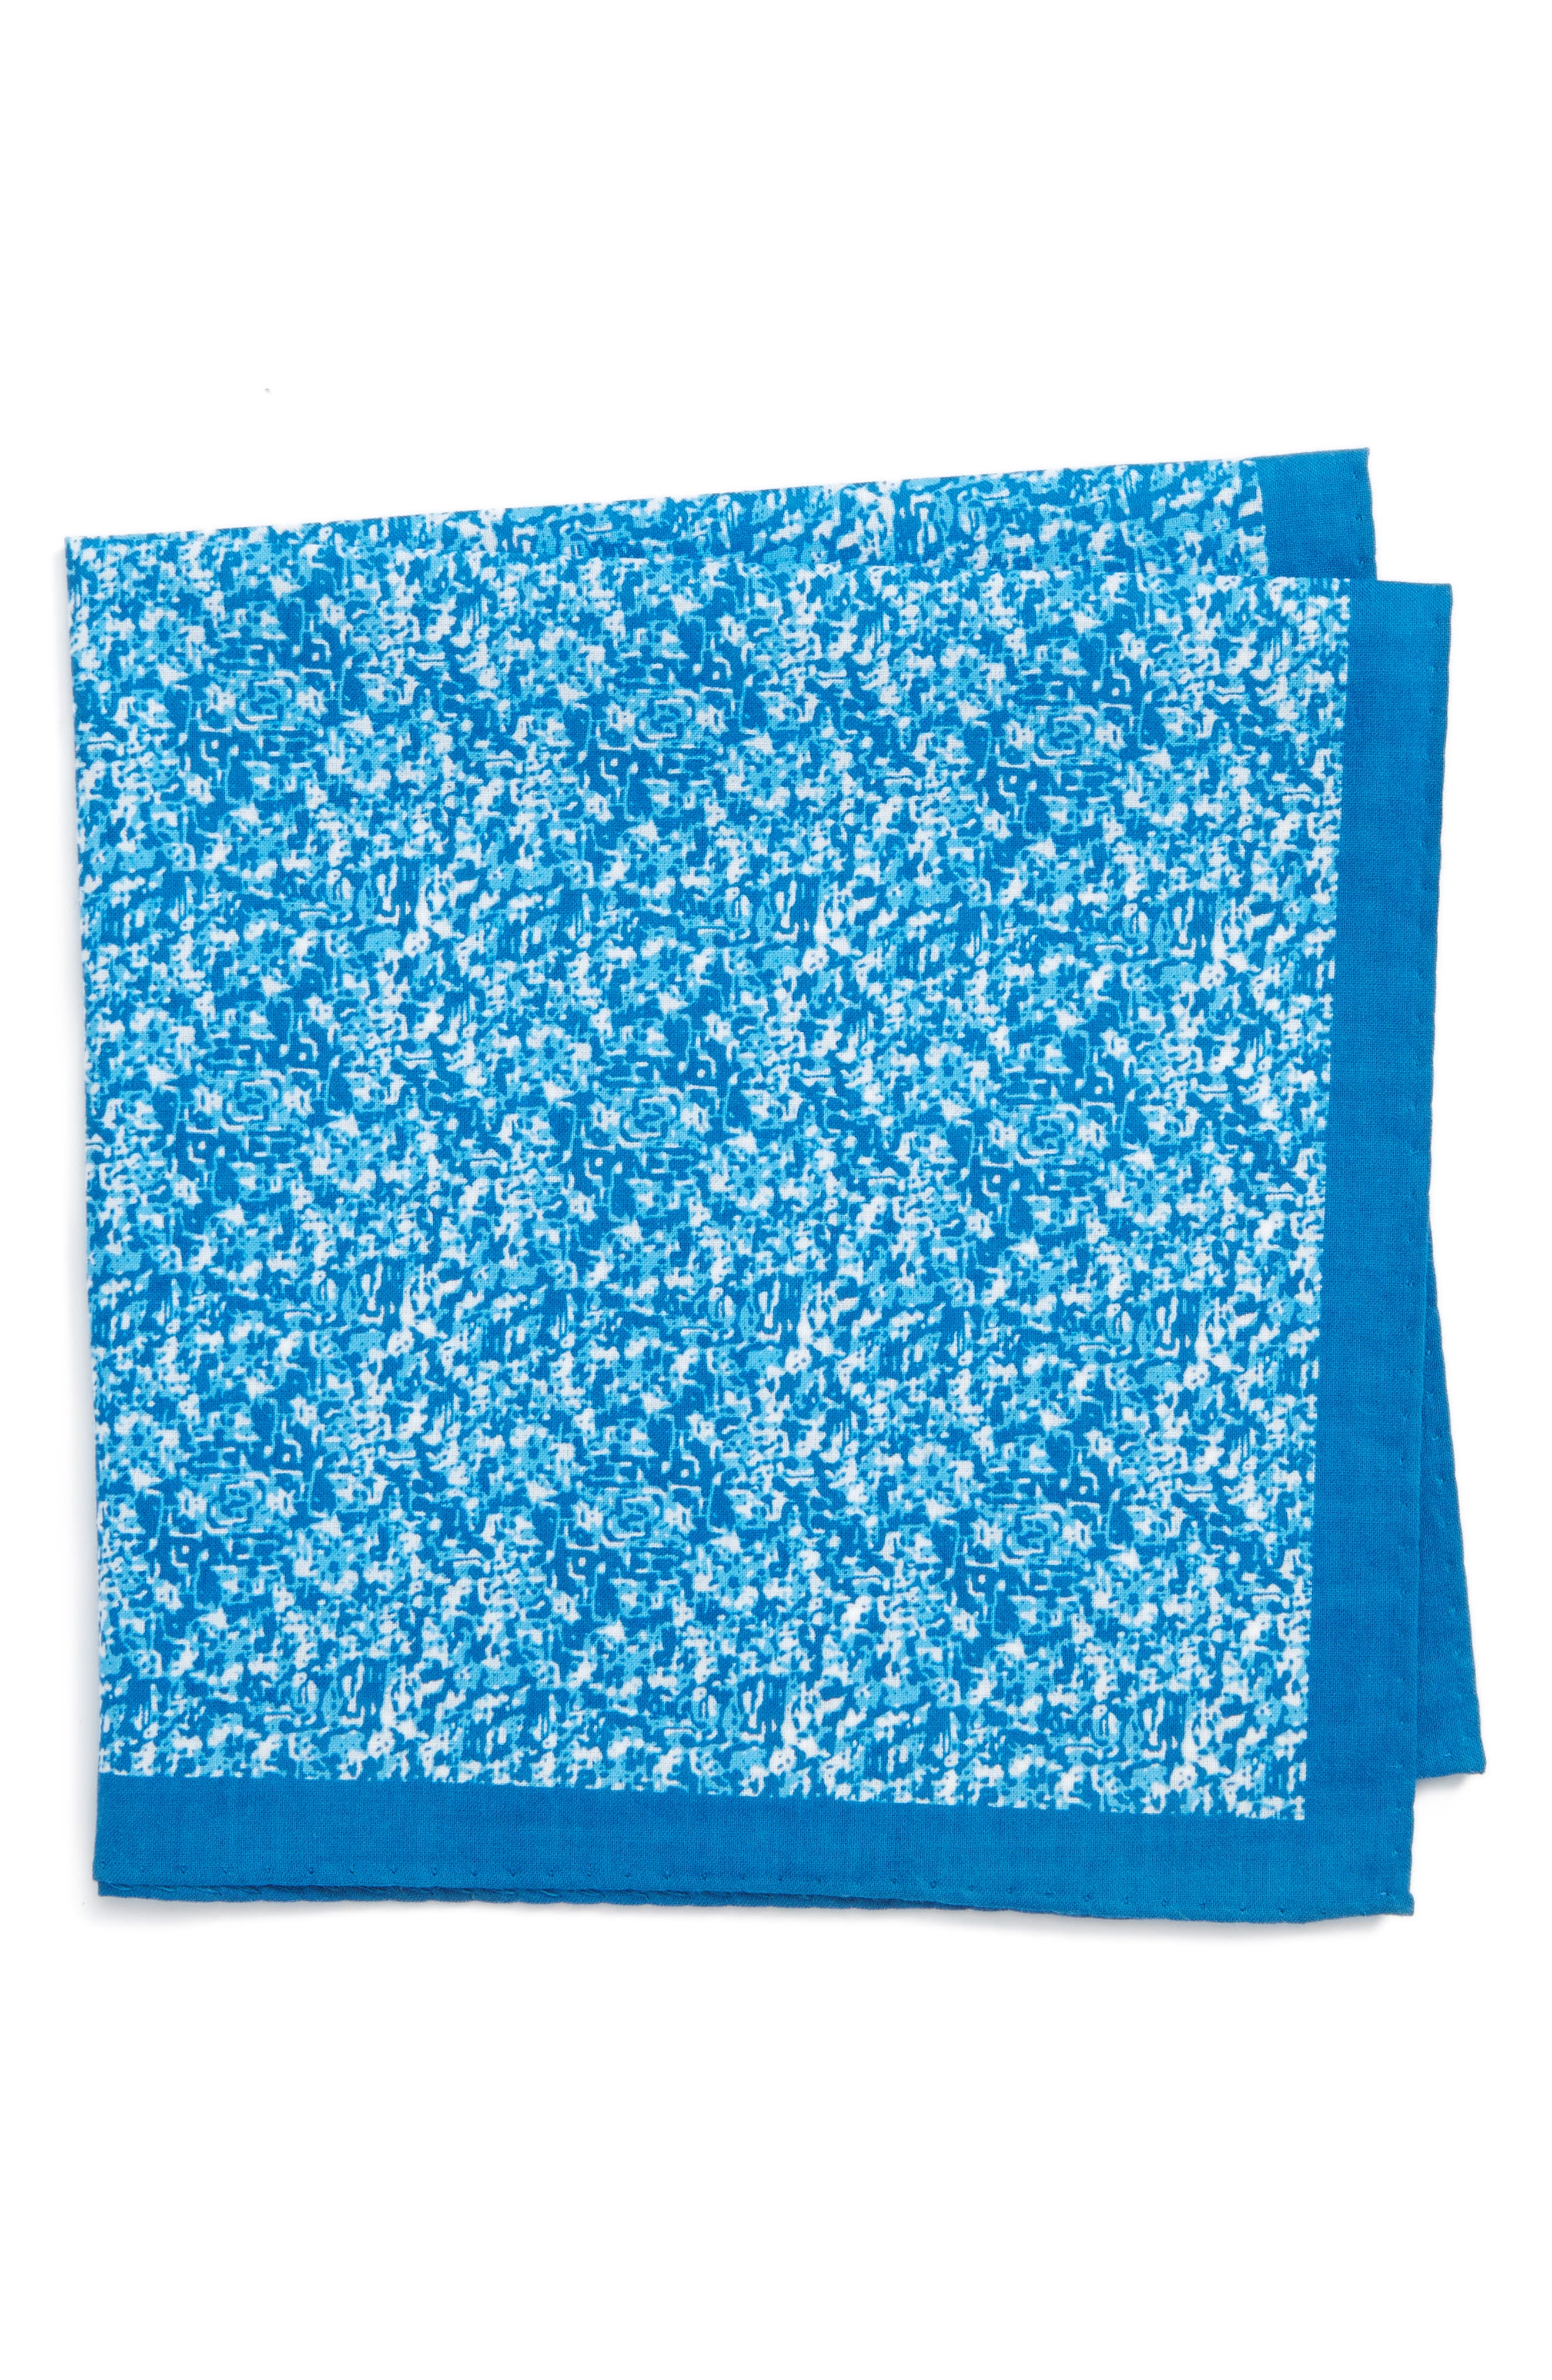 Alternate Image 1 Selected - Nordstrom Men's Shop Panso Print Cotton Pocket Square